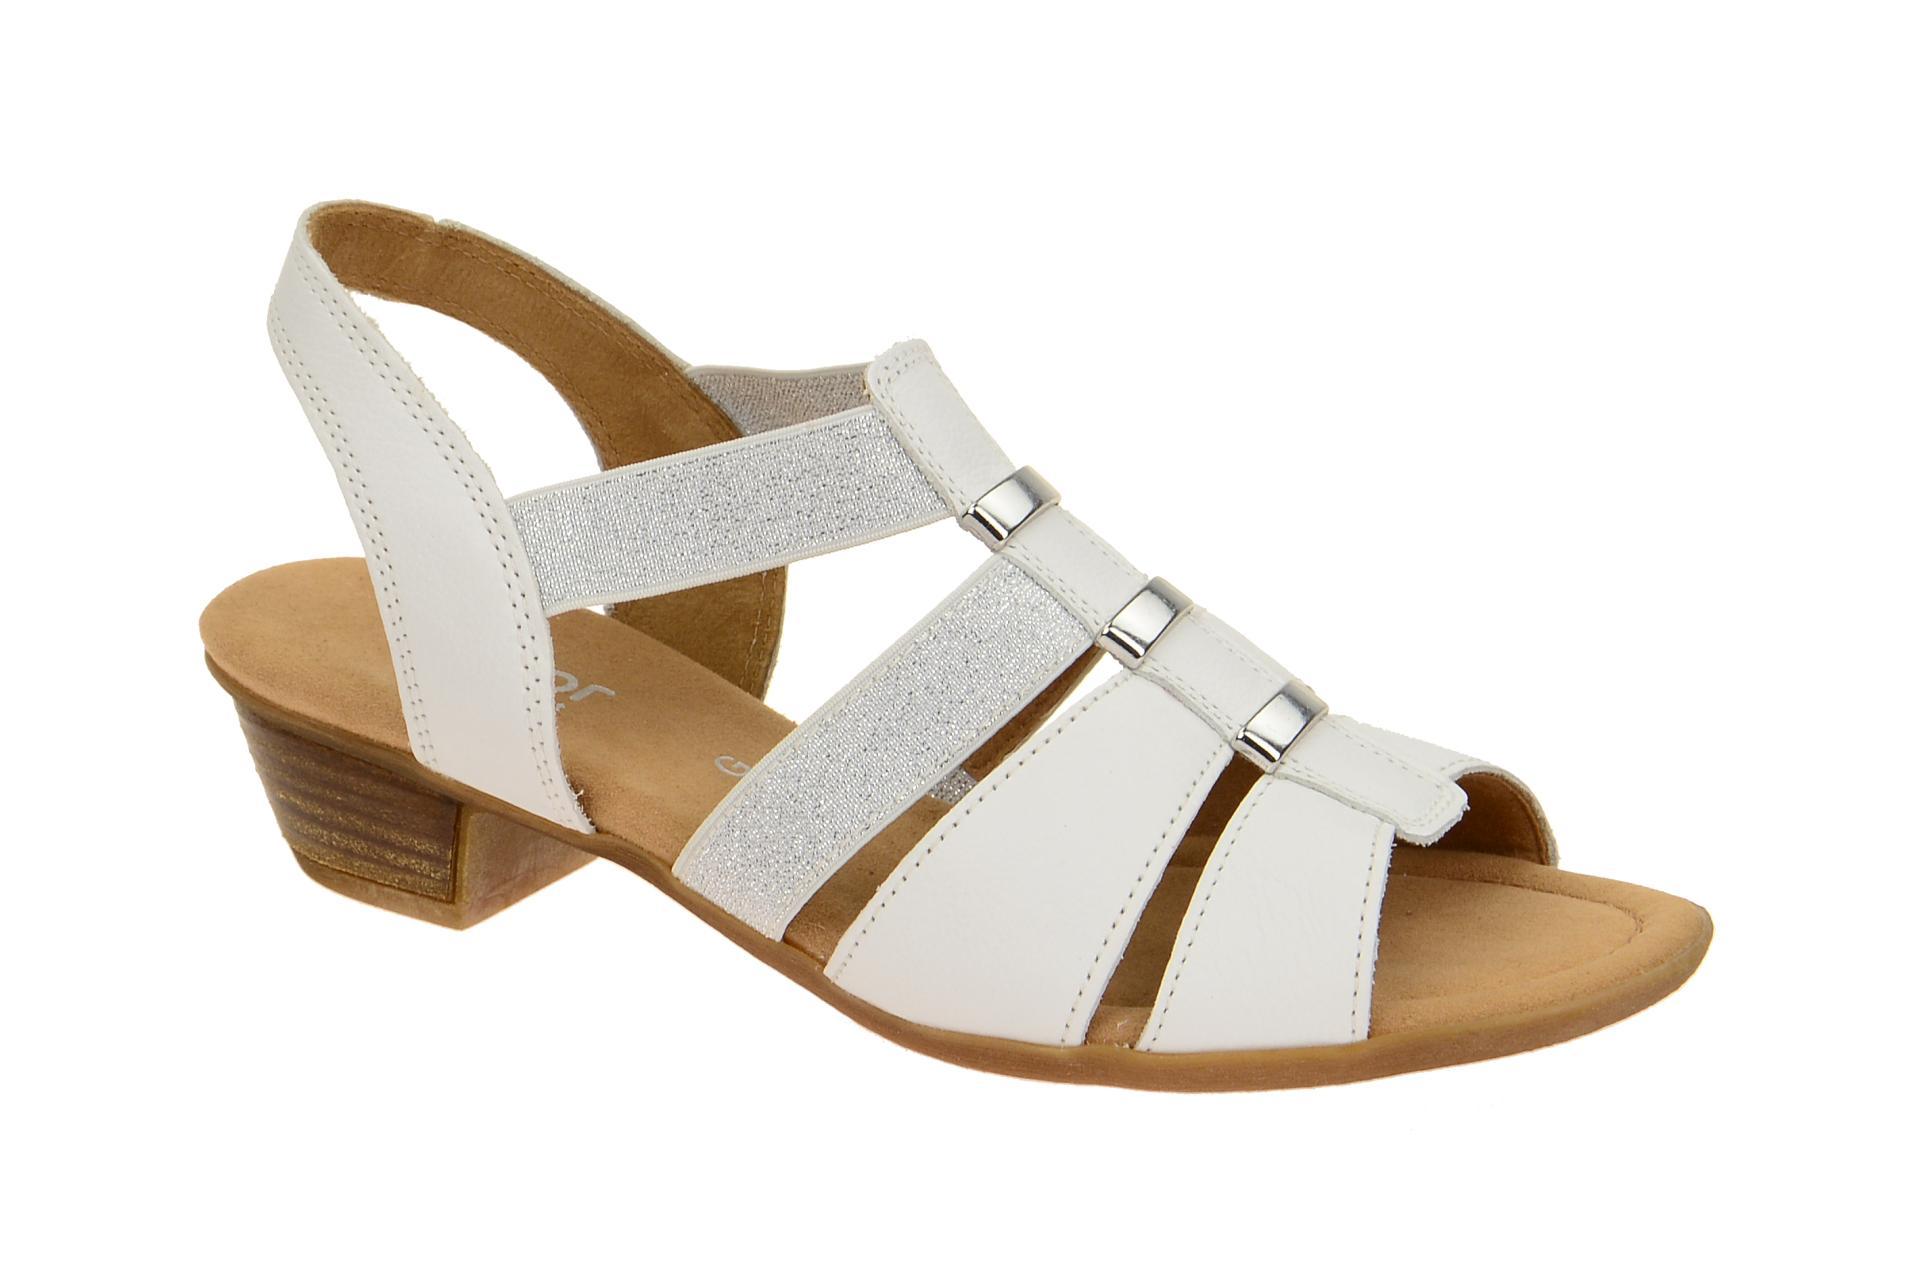 gabor schuhe kreta wei damen sandalette riemchen sandalen neu ebay. Black Bedroom Furniture Sets. Home Design Ideas